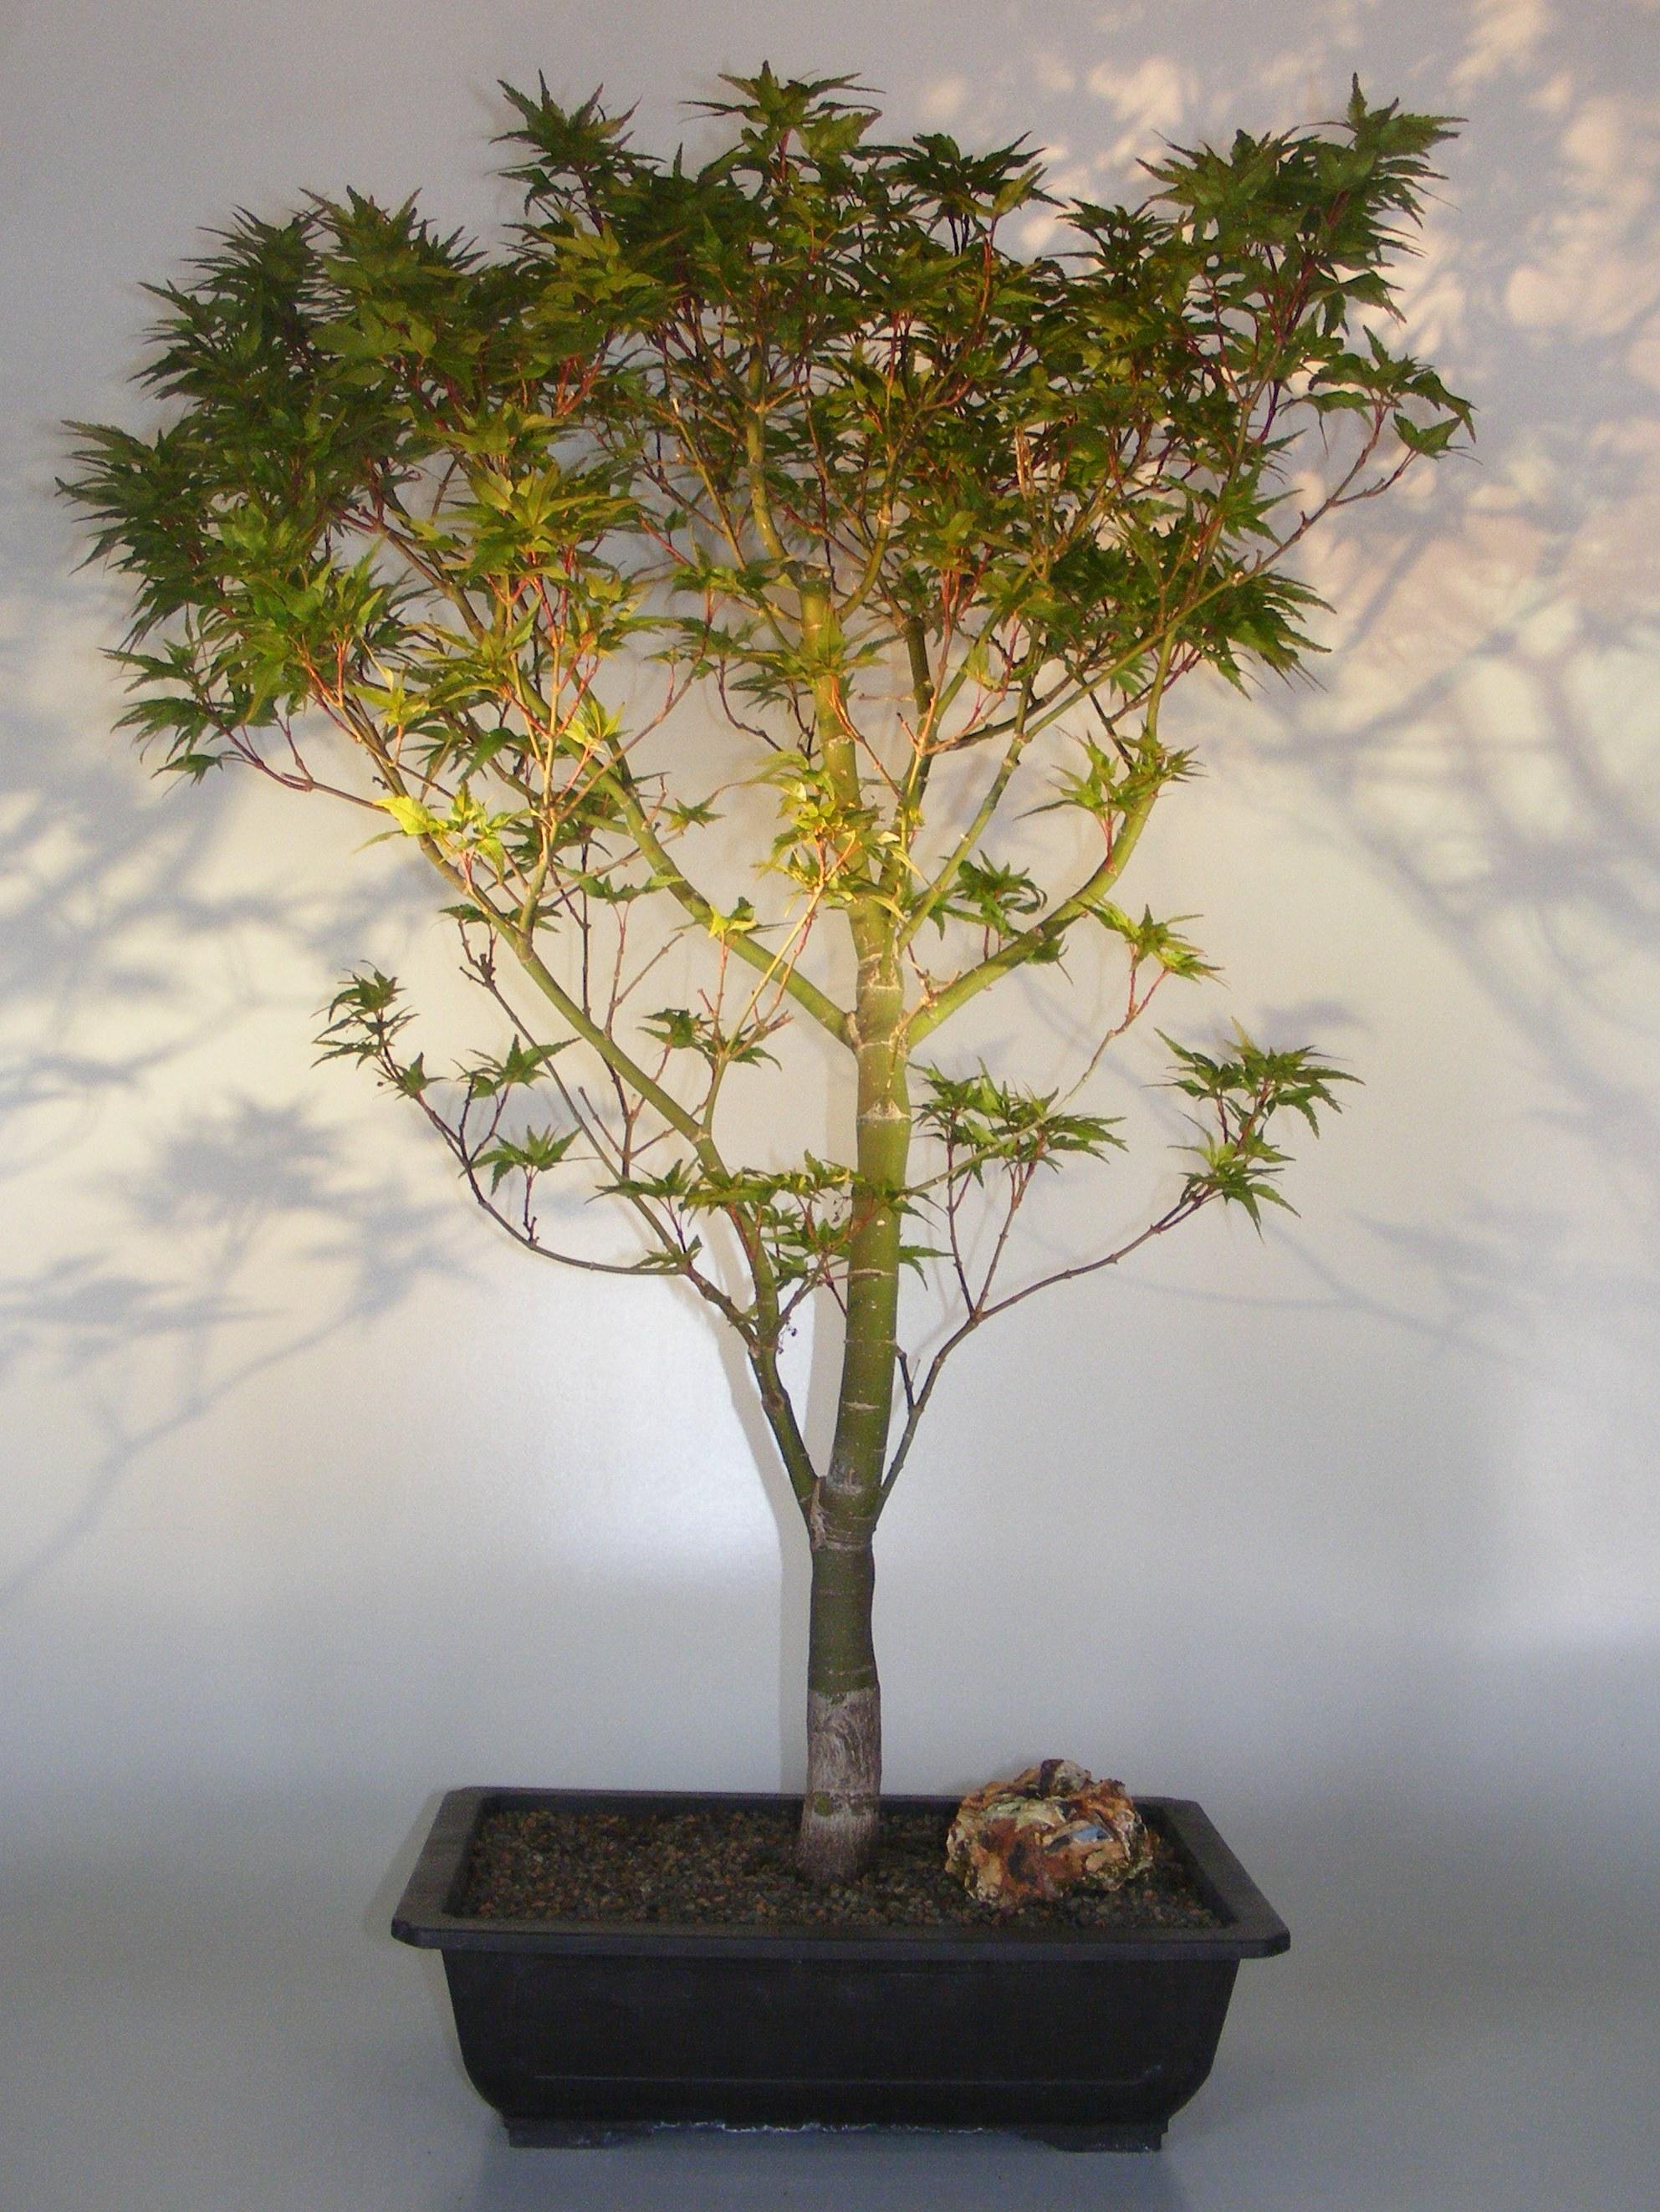 Dwarf Japanese Maple Bonsai Tree(acer palmatum 'Taro yama') Image